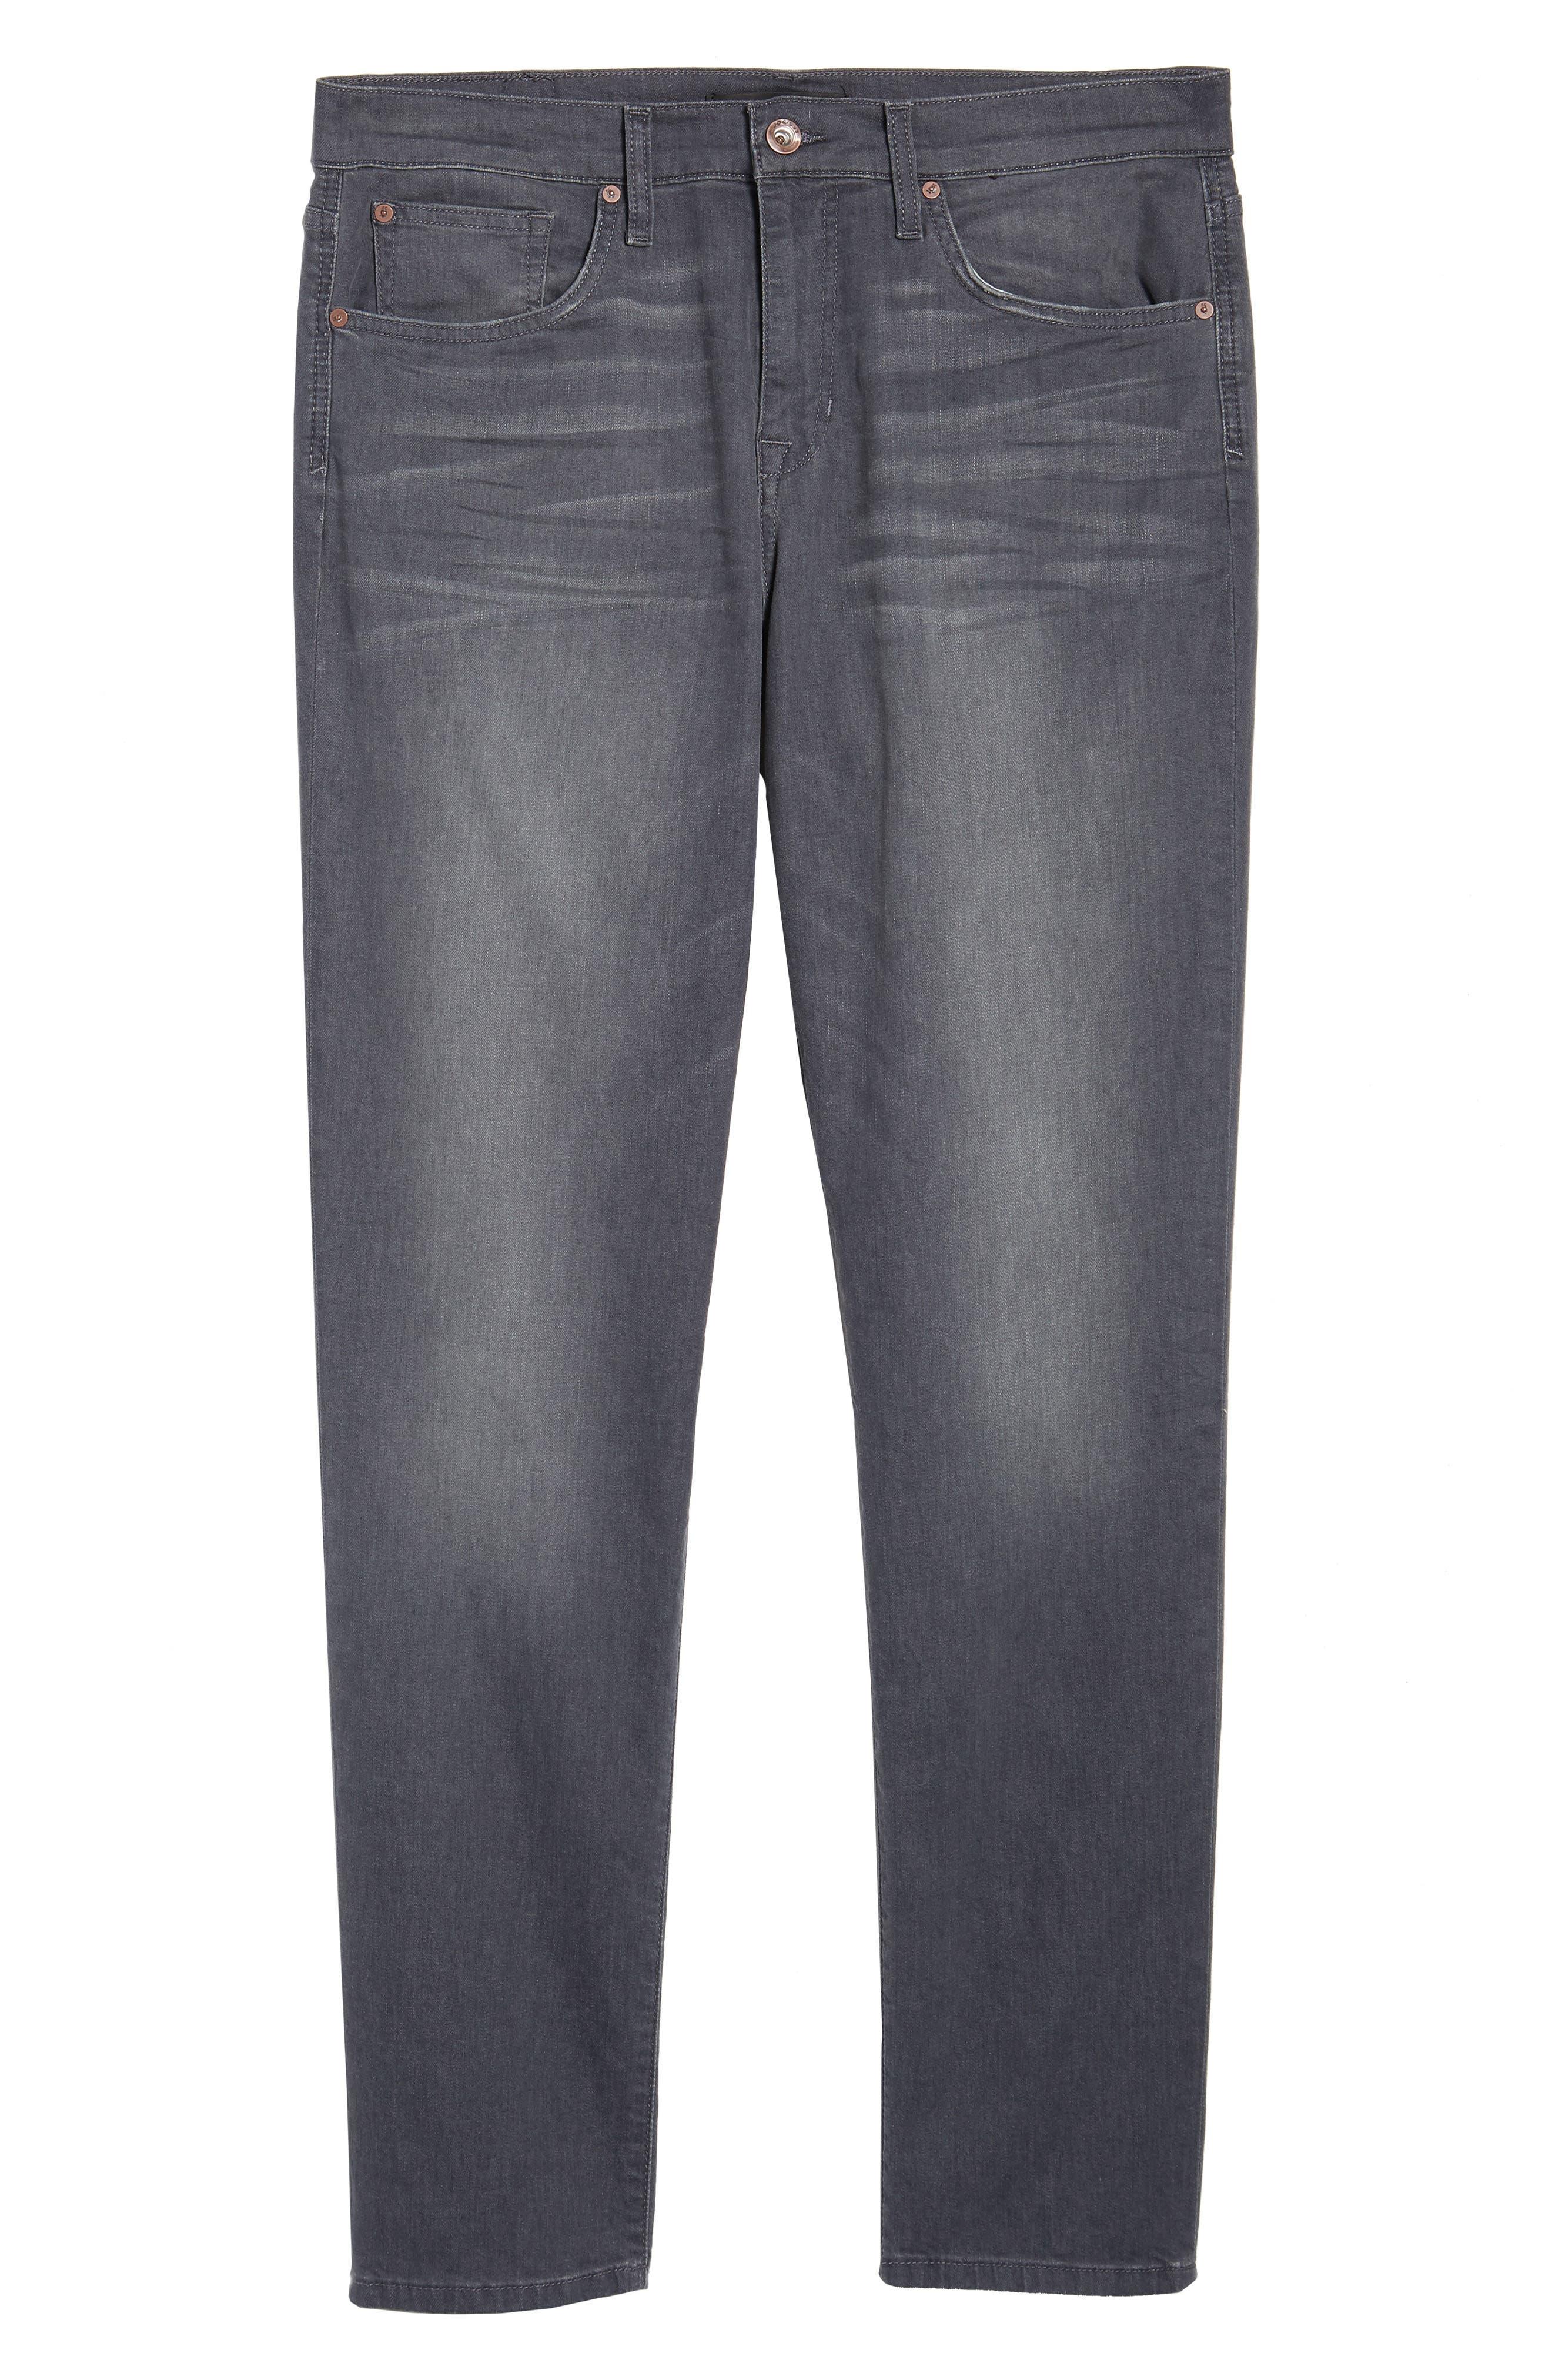 Folsom Athletic Slim Fit Jeans,                             Alternate thumbnail 6, color,                             Julian